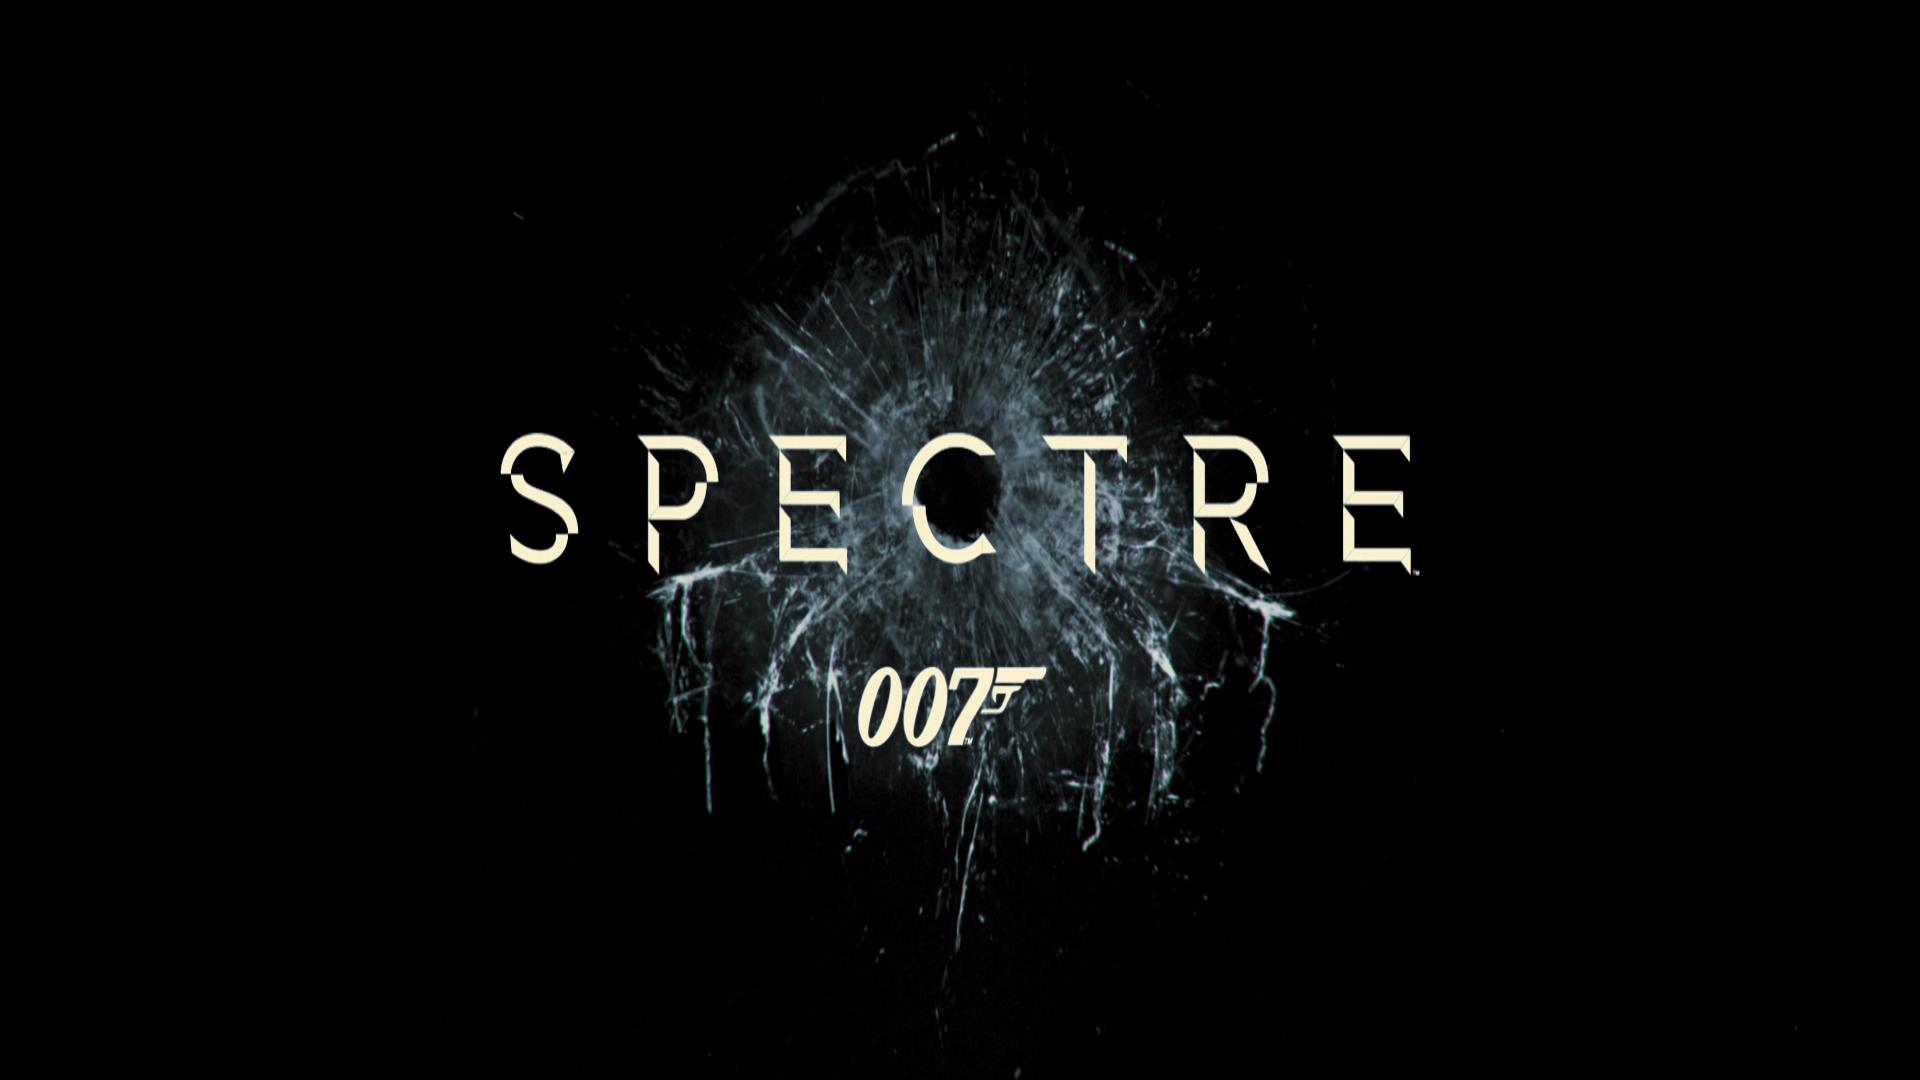 Spectre HD Wallpapers 1920x1080